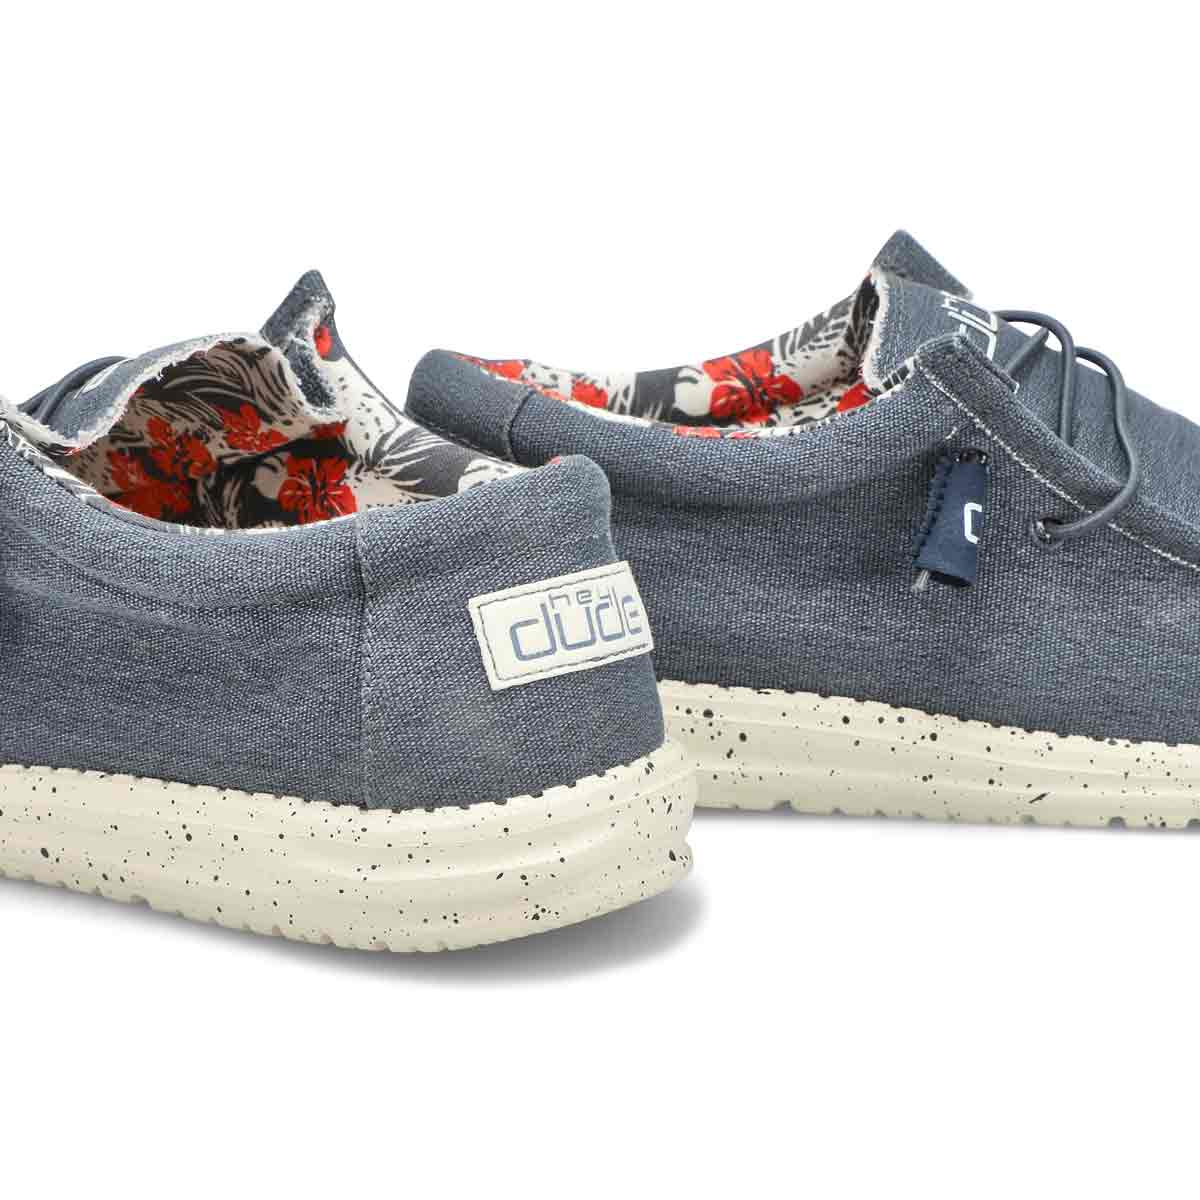 Men's Wally Stretch Casual Shoe - Blue